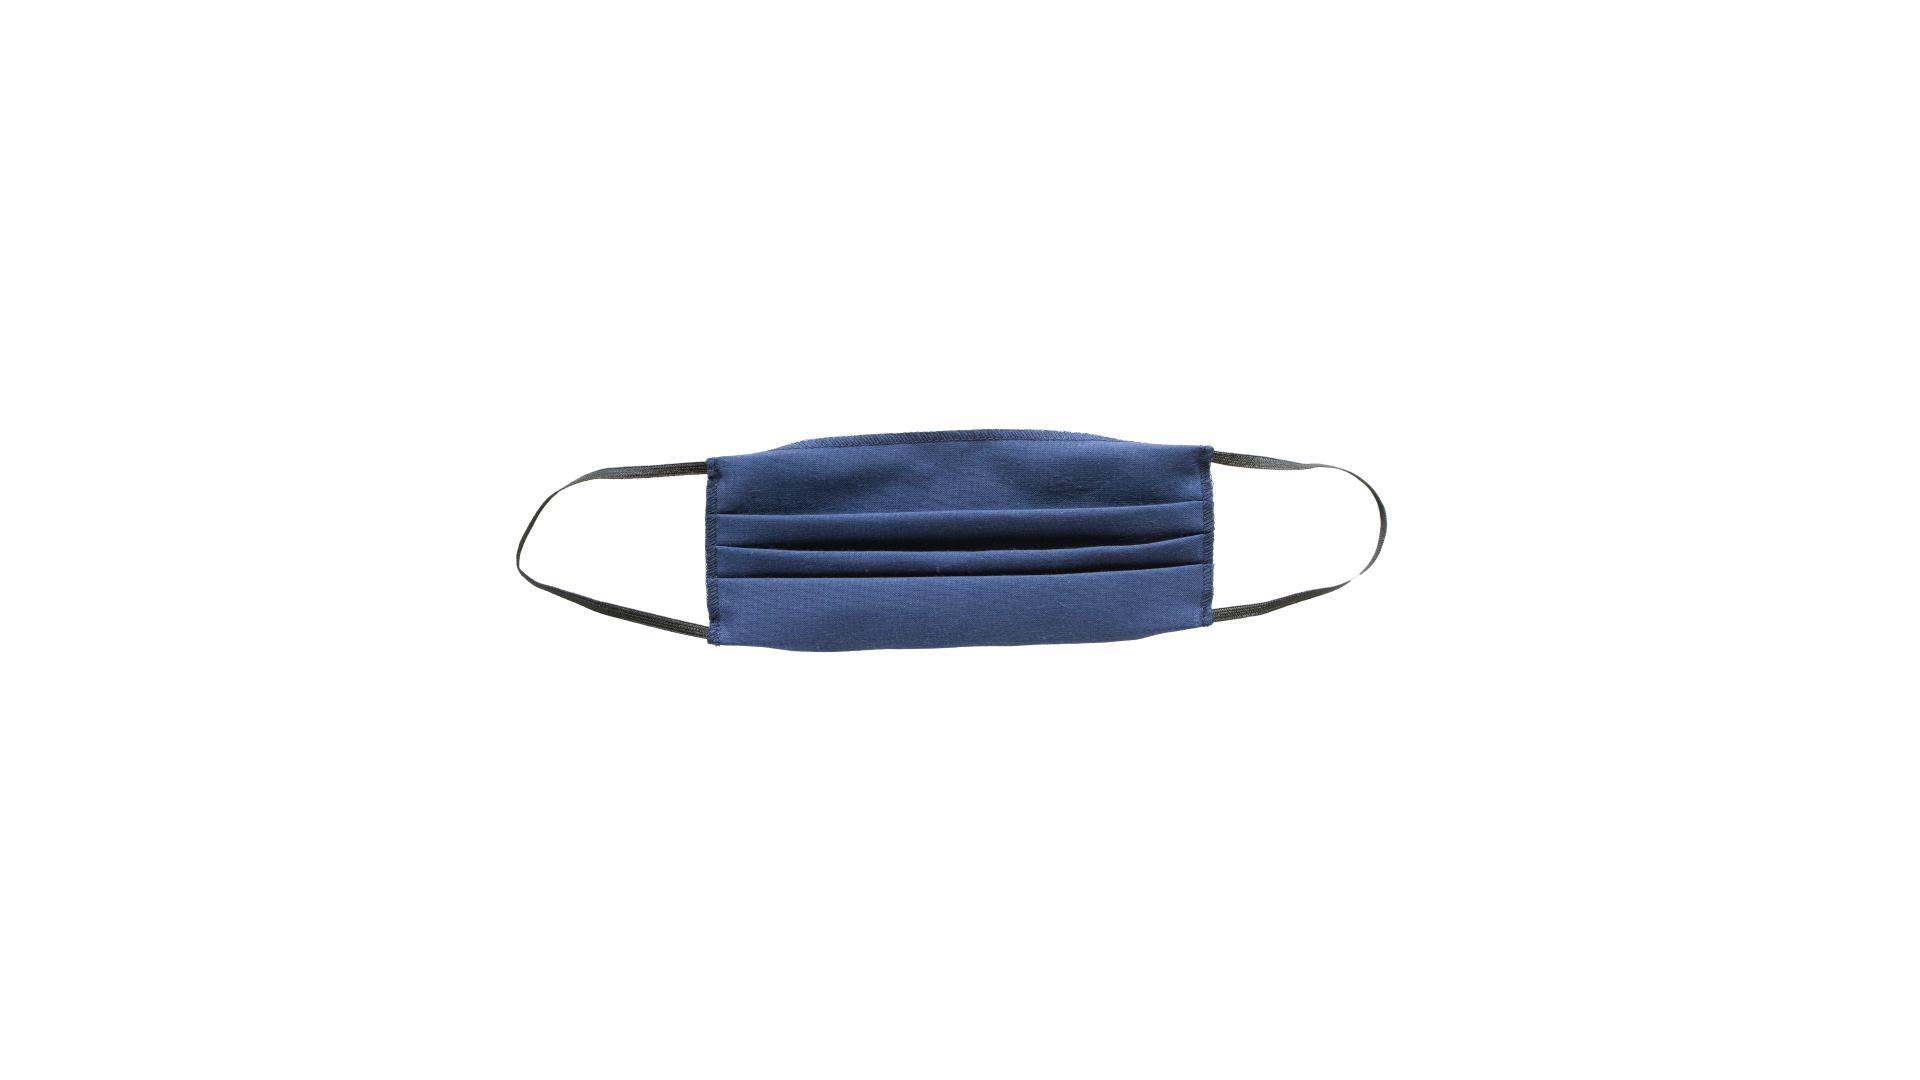 4CARS Dvouvrstvé ochranné bavlněné rouško modré bez vzoru s gumičkou 1ks